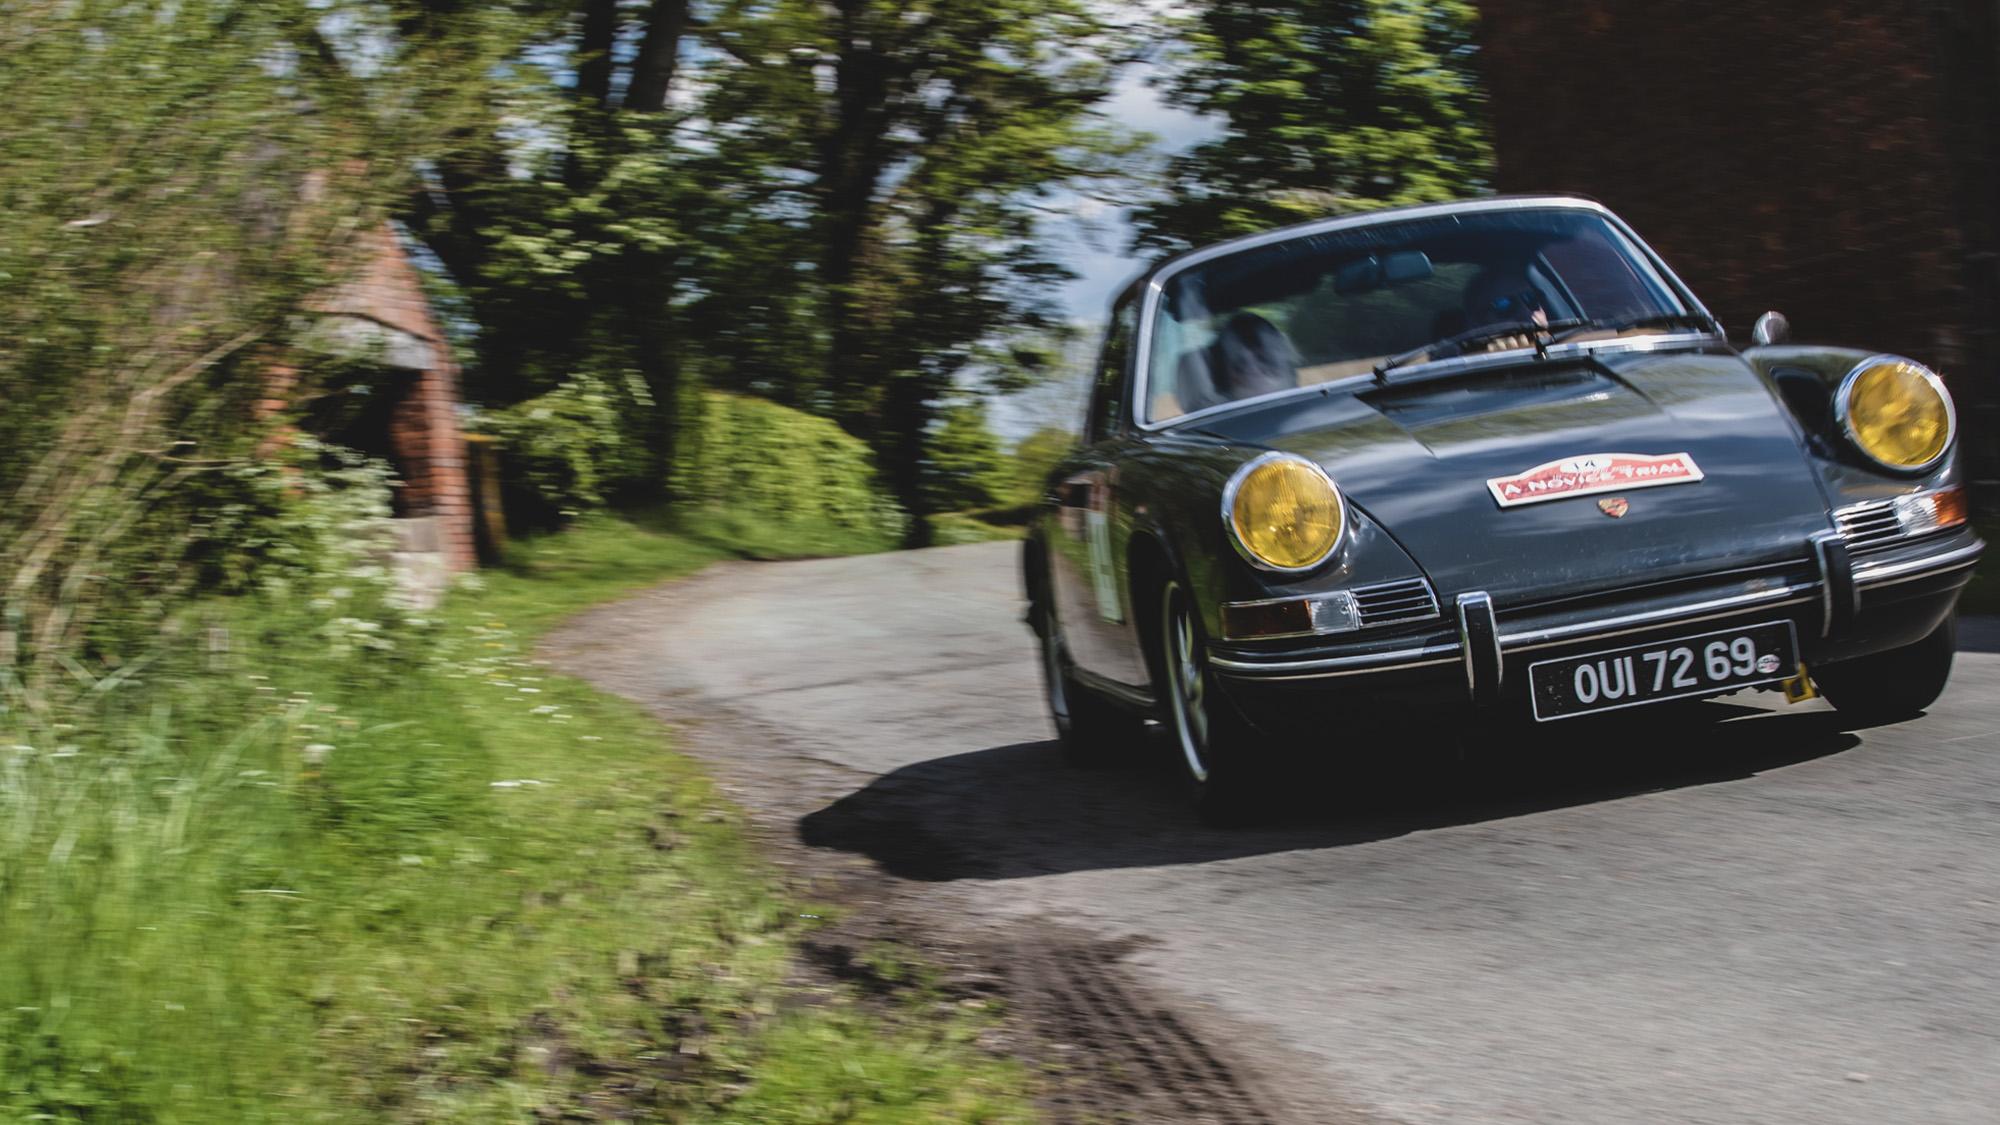 Porsche 911 on HERO Novice Trial 2019 event